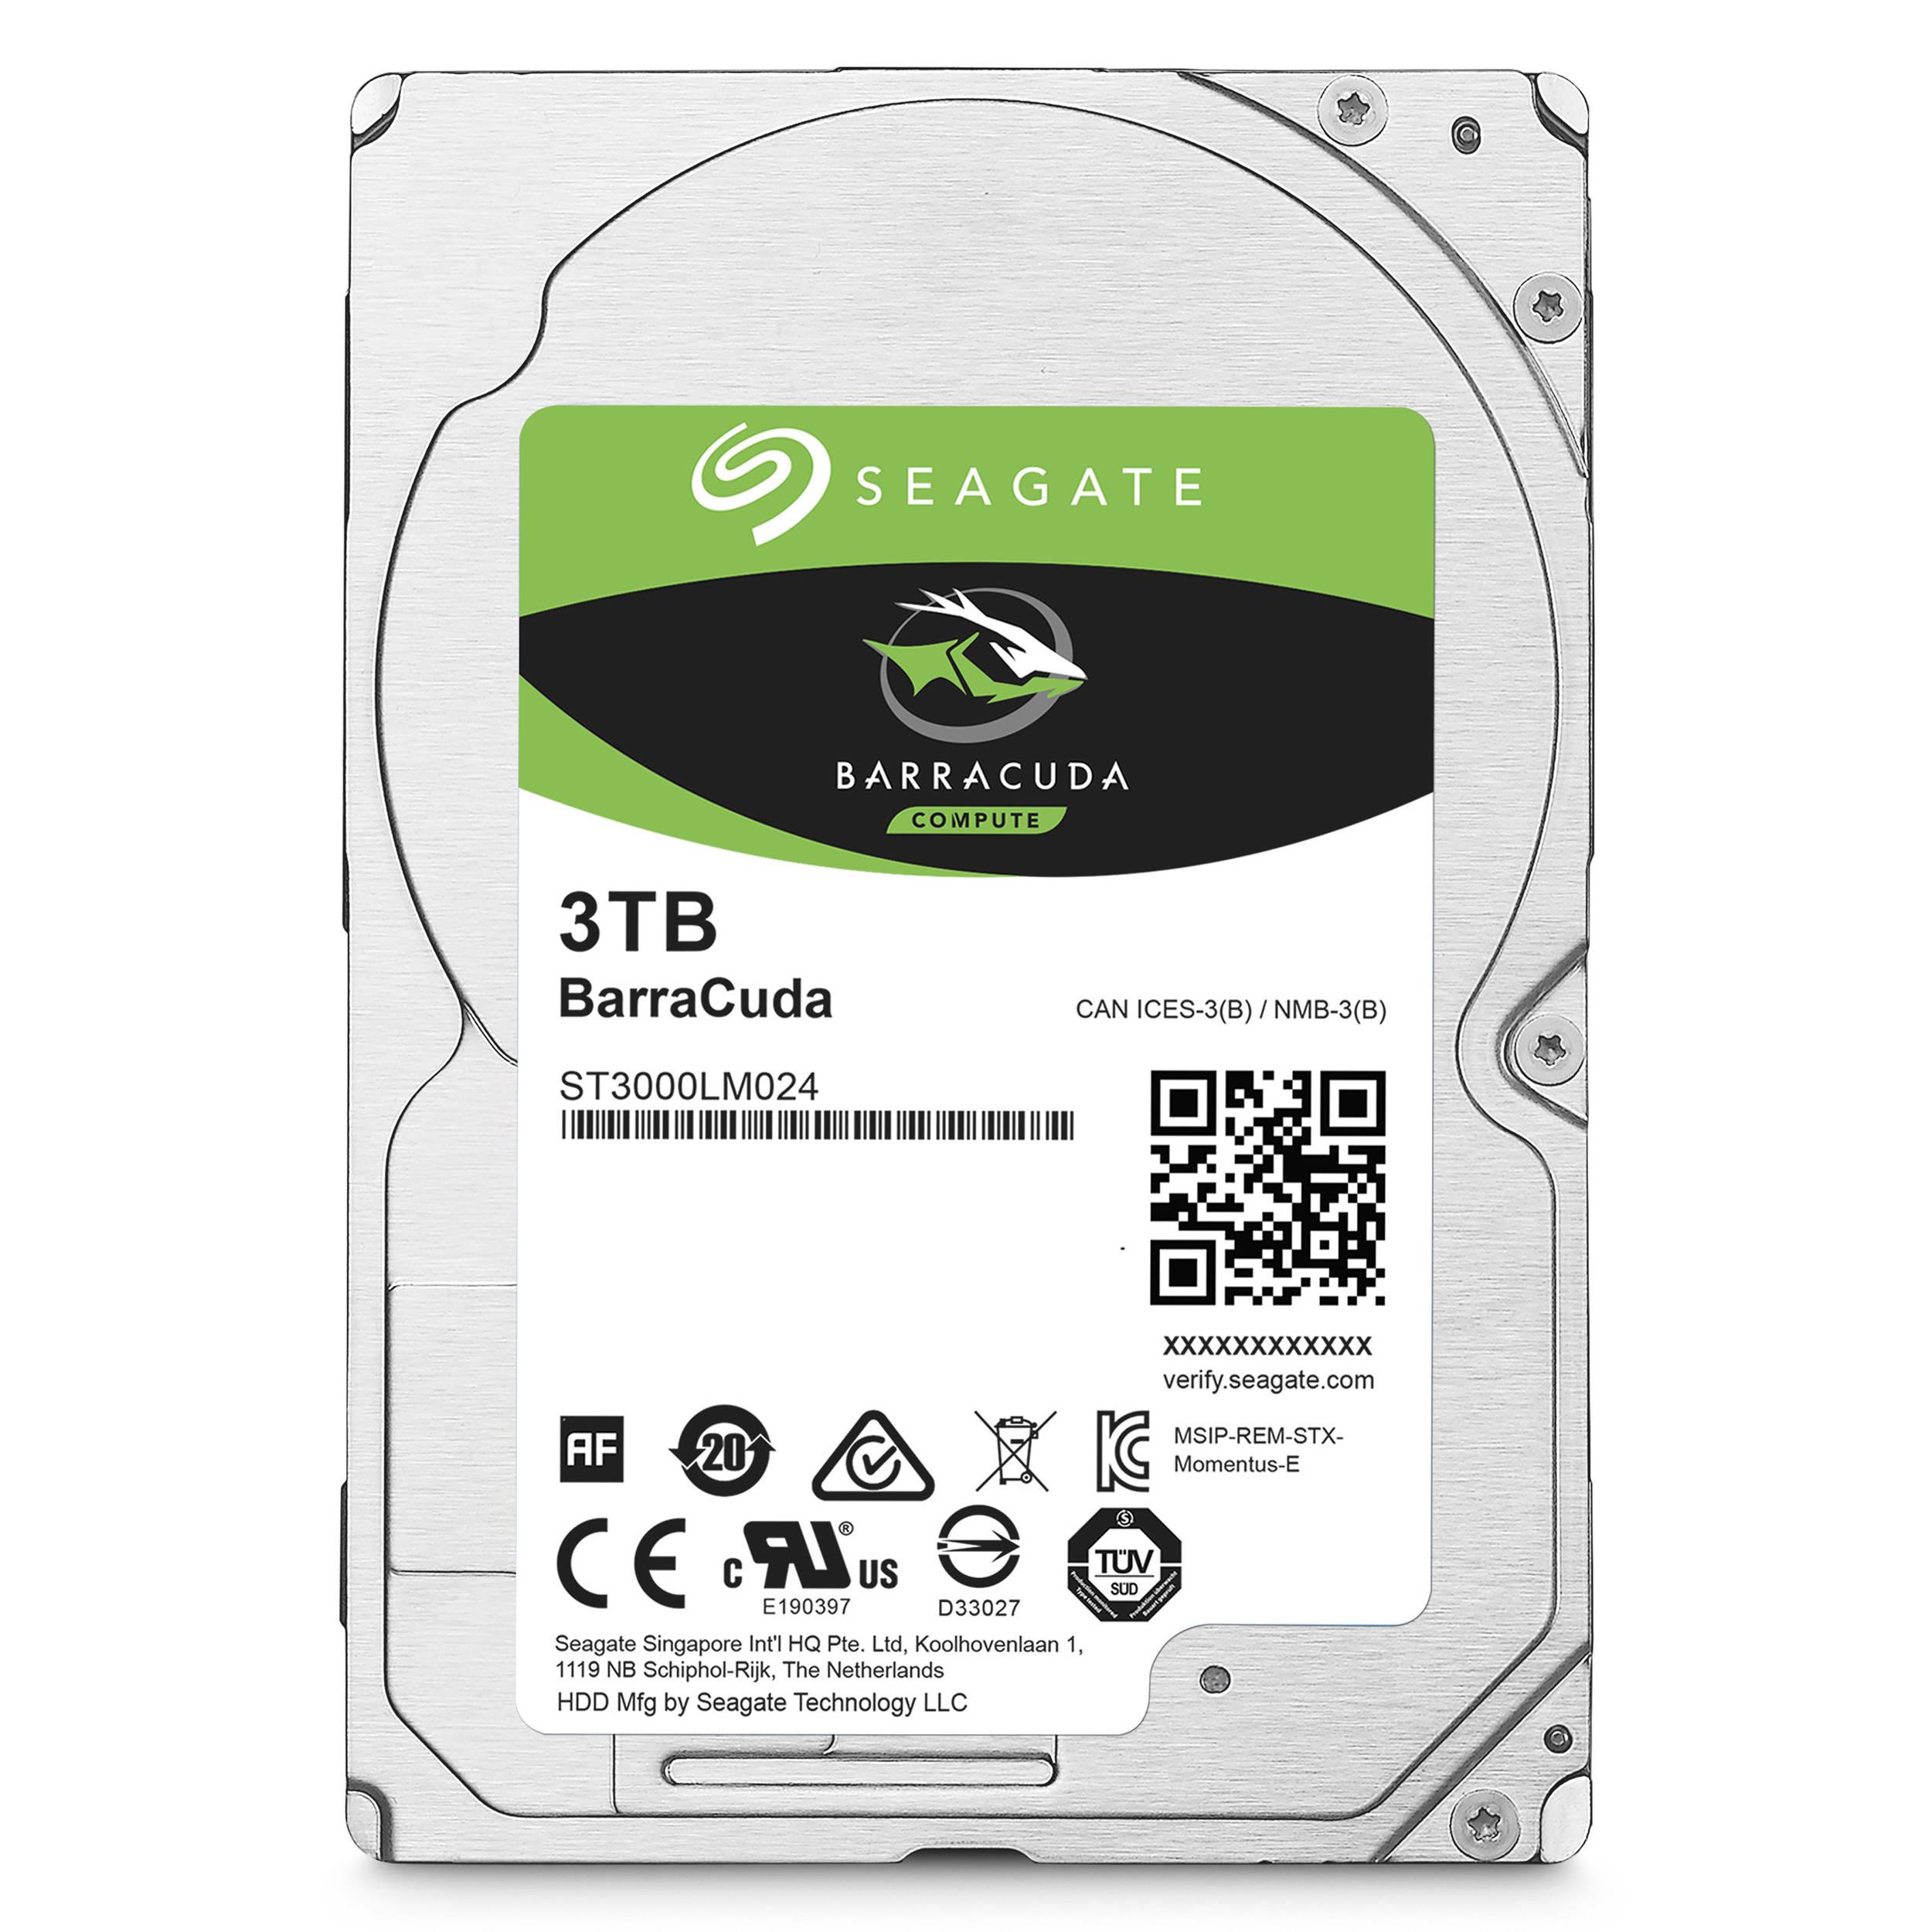 Seagate 3TB Internal BarraCuda SATA 2.5 Hard Drive